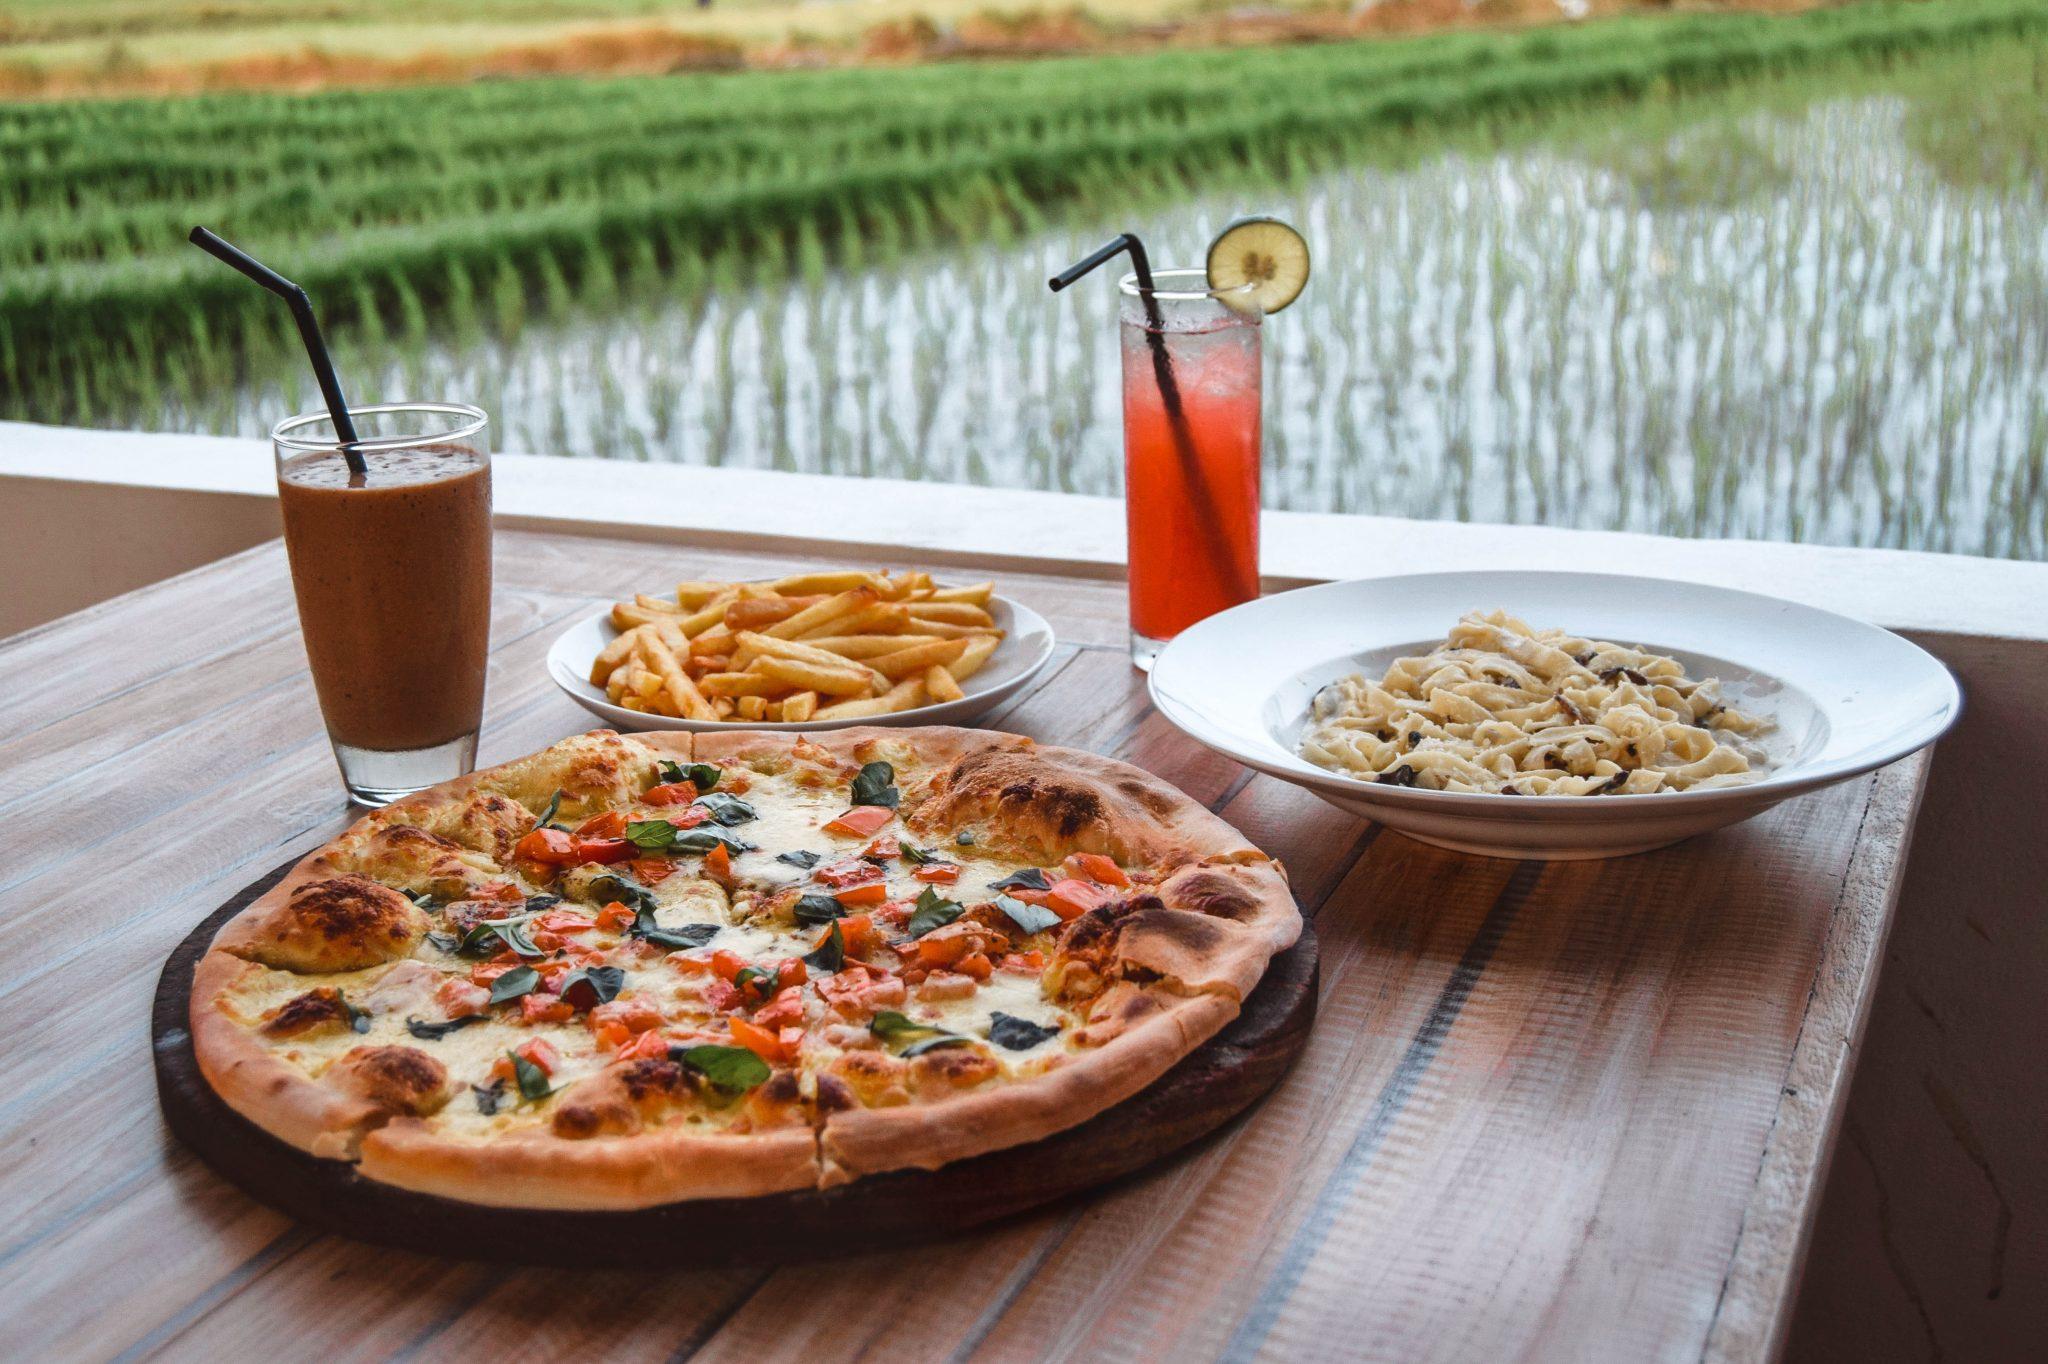 Wanderers & Warriors - Garden Canggu By Pizza House Restaurant Canggu Bali - Best Restaurants In Bali Food - Best Restaurants In Canggu